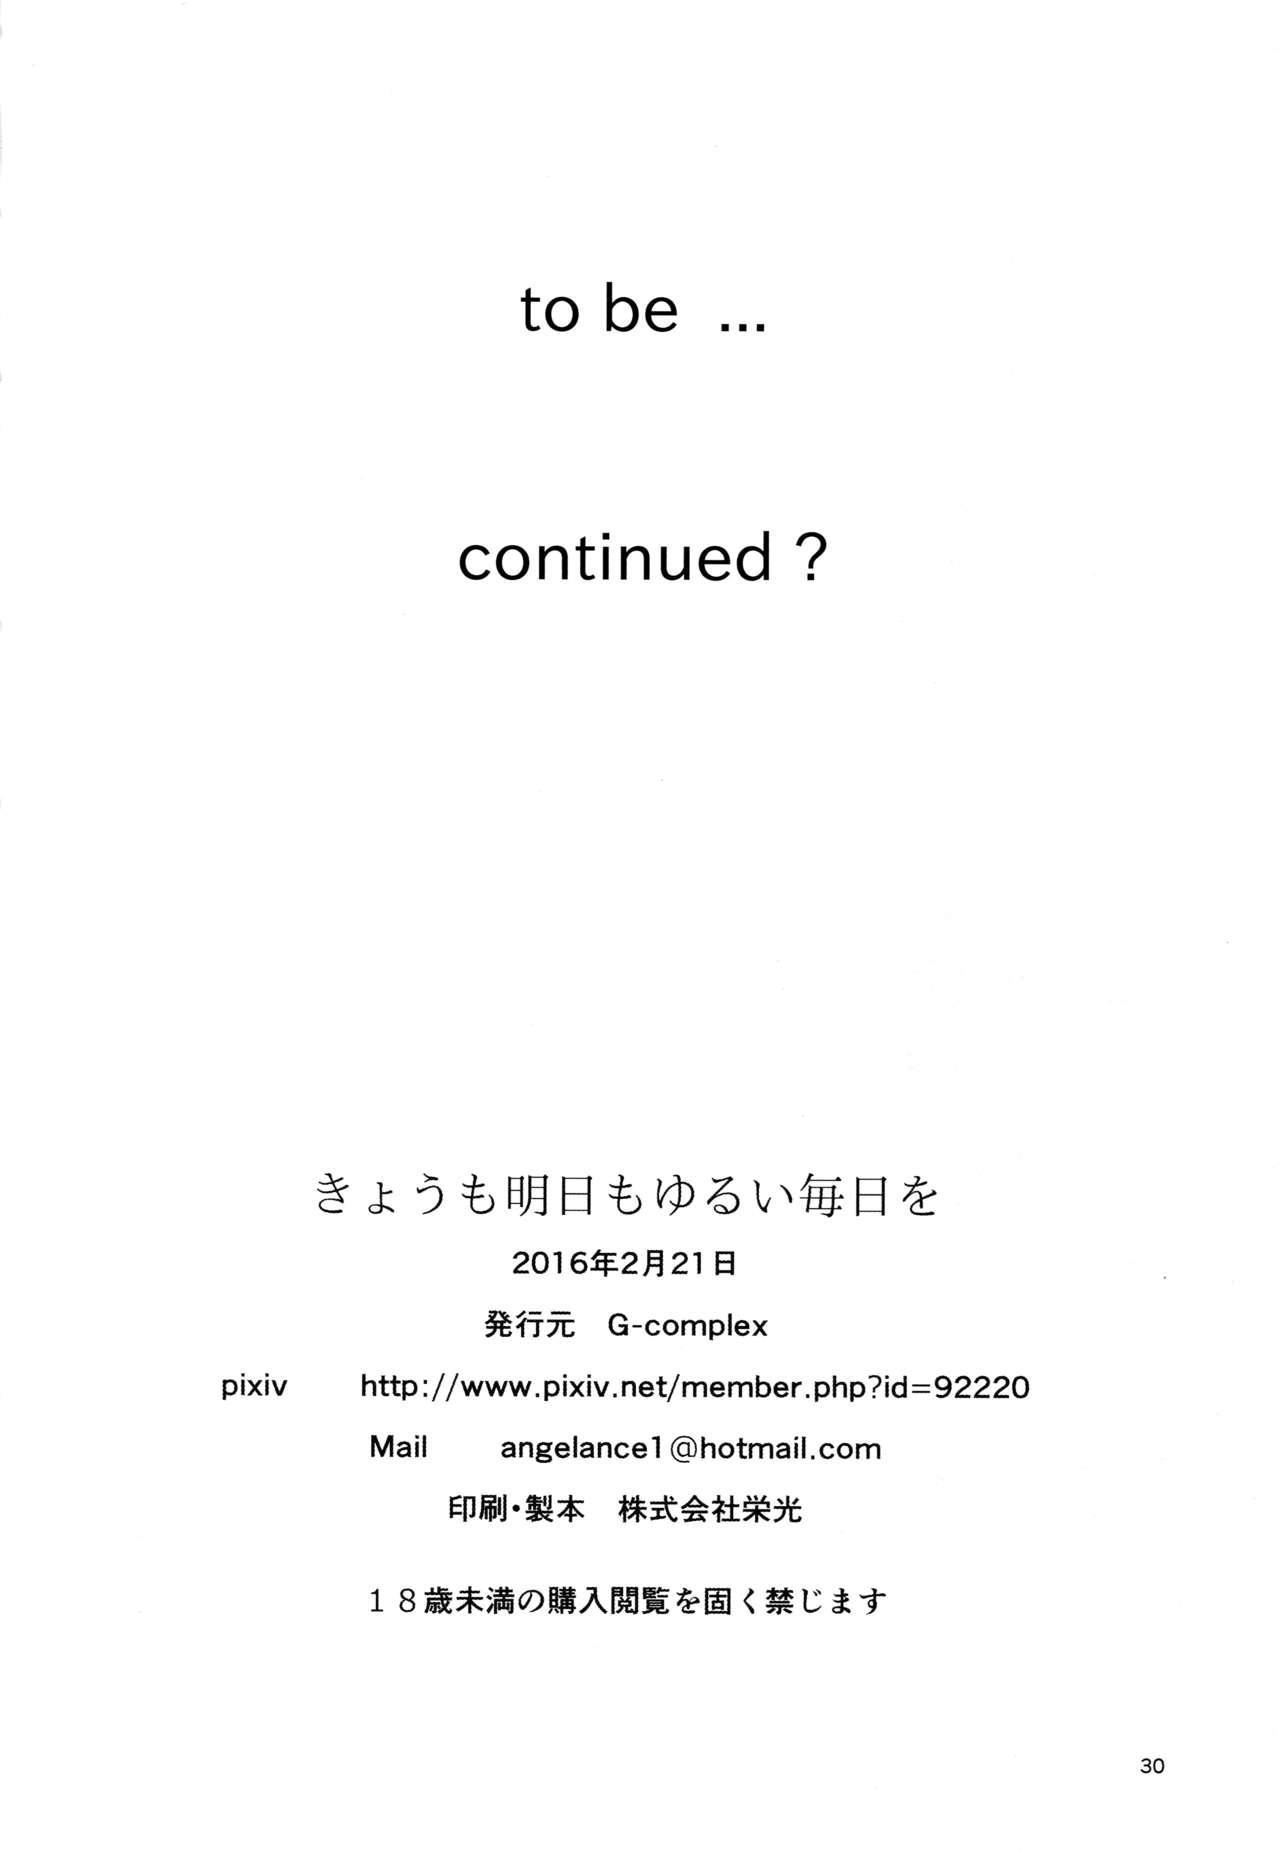 (Girls Love Festival 16) [G-complex (YUI_7)] Kyou mo Ashita mo Yurui Hibi o - Yui and Kyoko and forever loose day-to-day (YuruYuri) 28